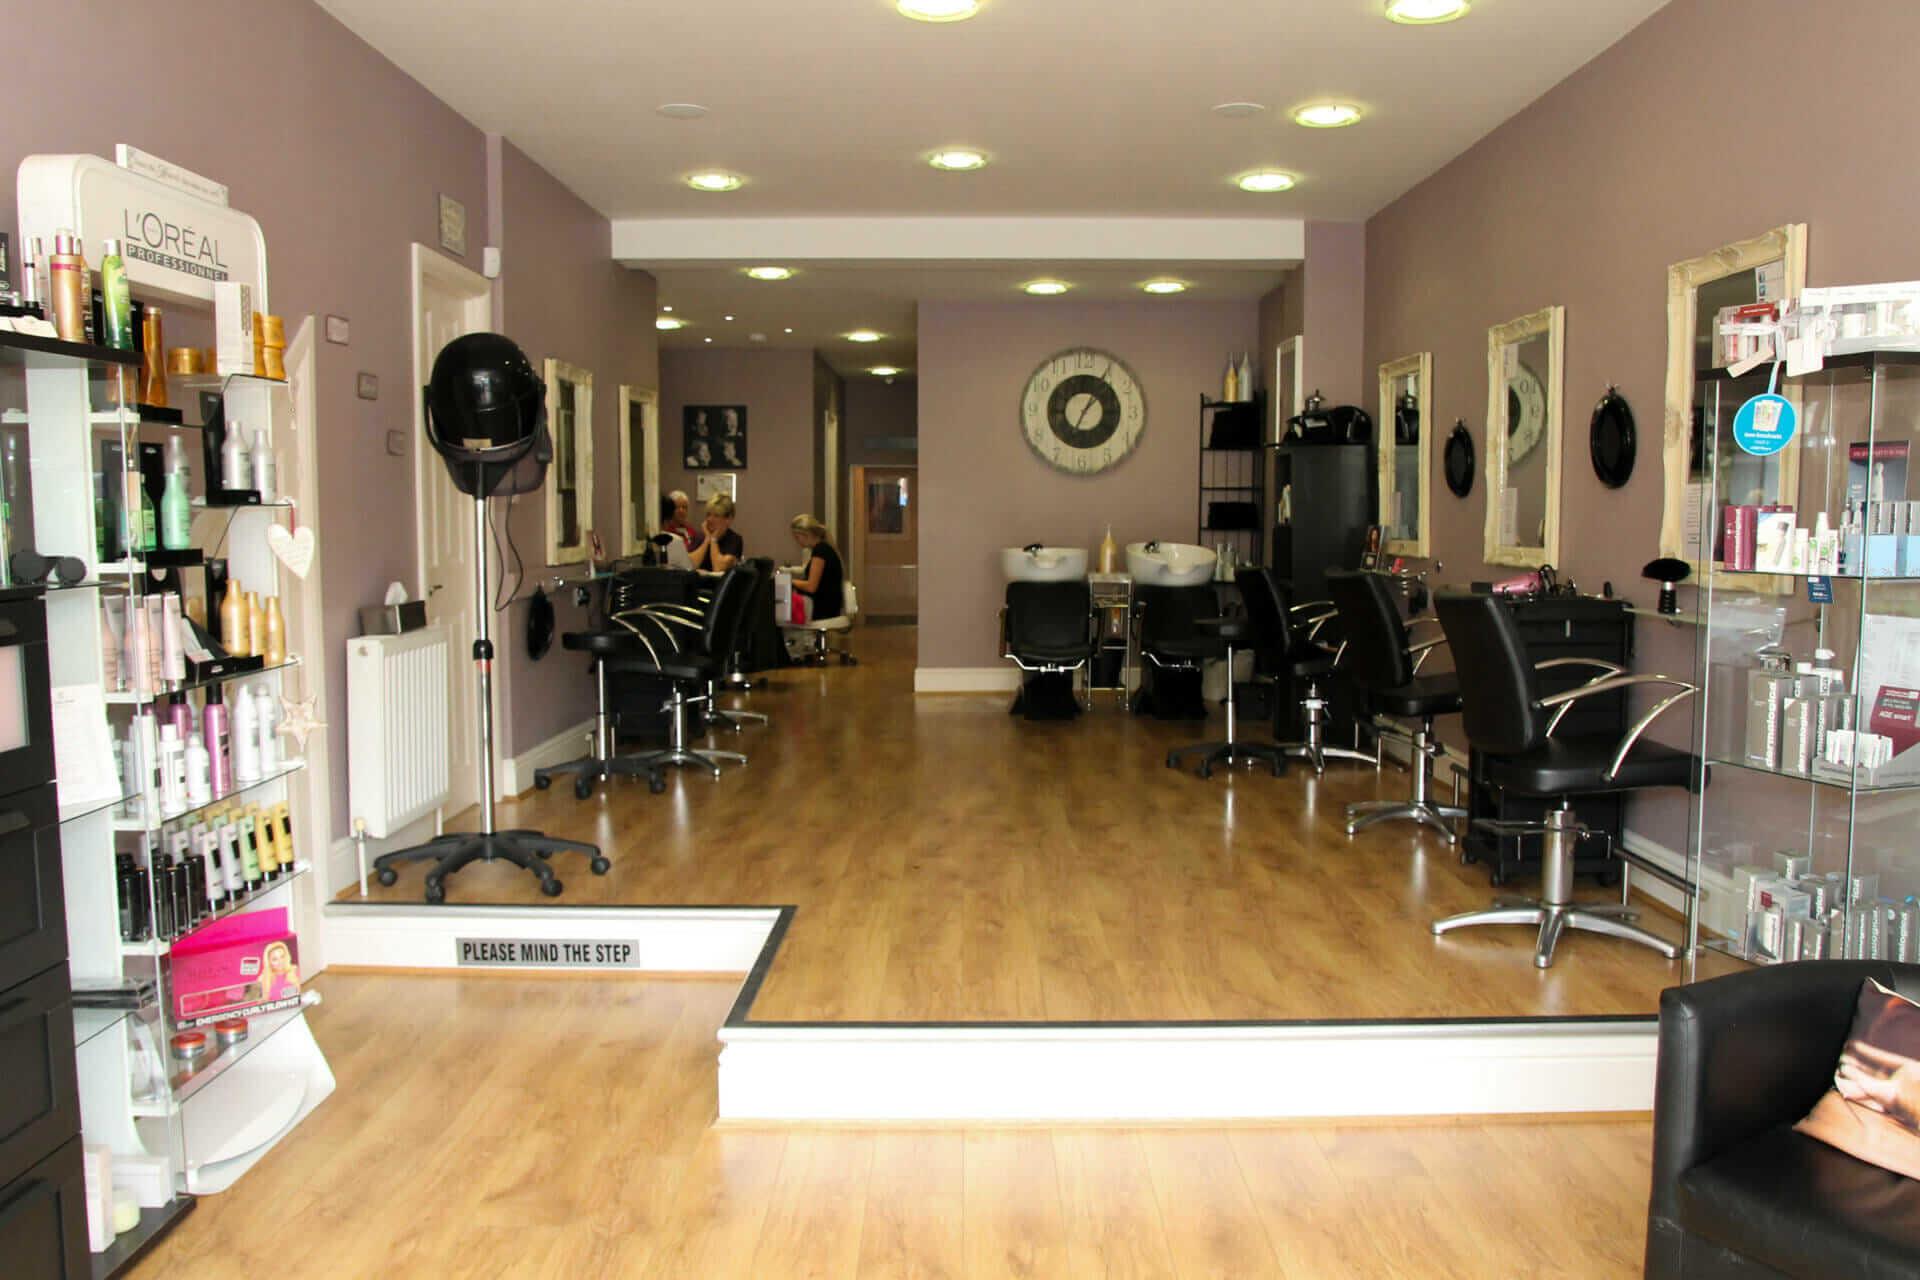 Serenity-hairdressing-salon-Orpington-2